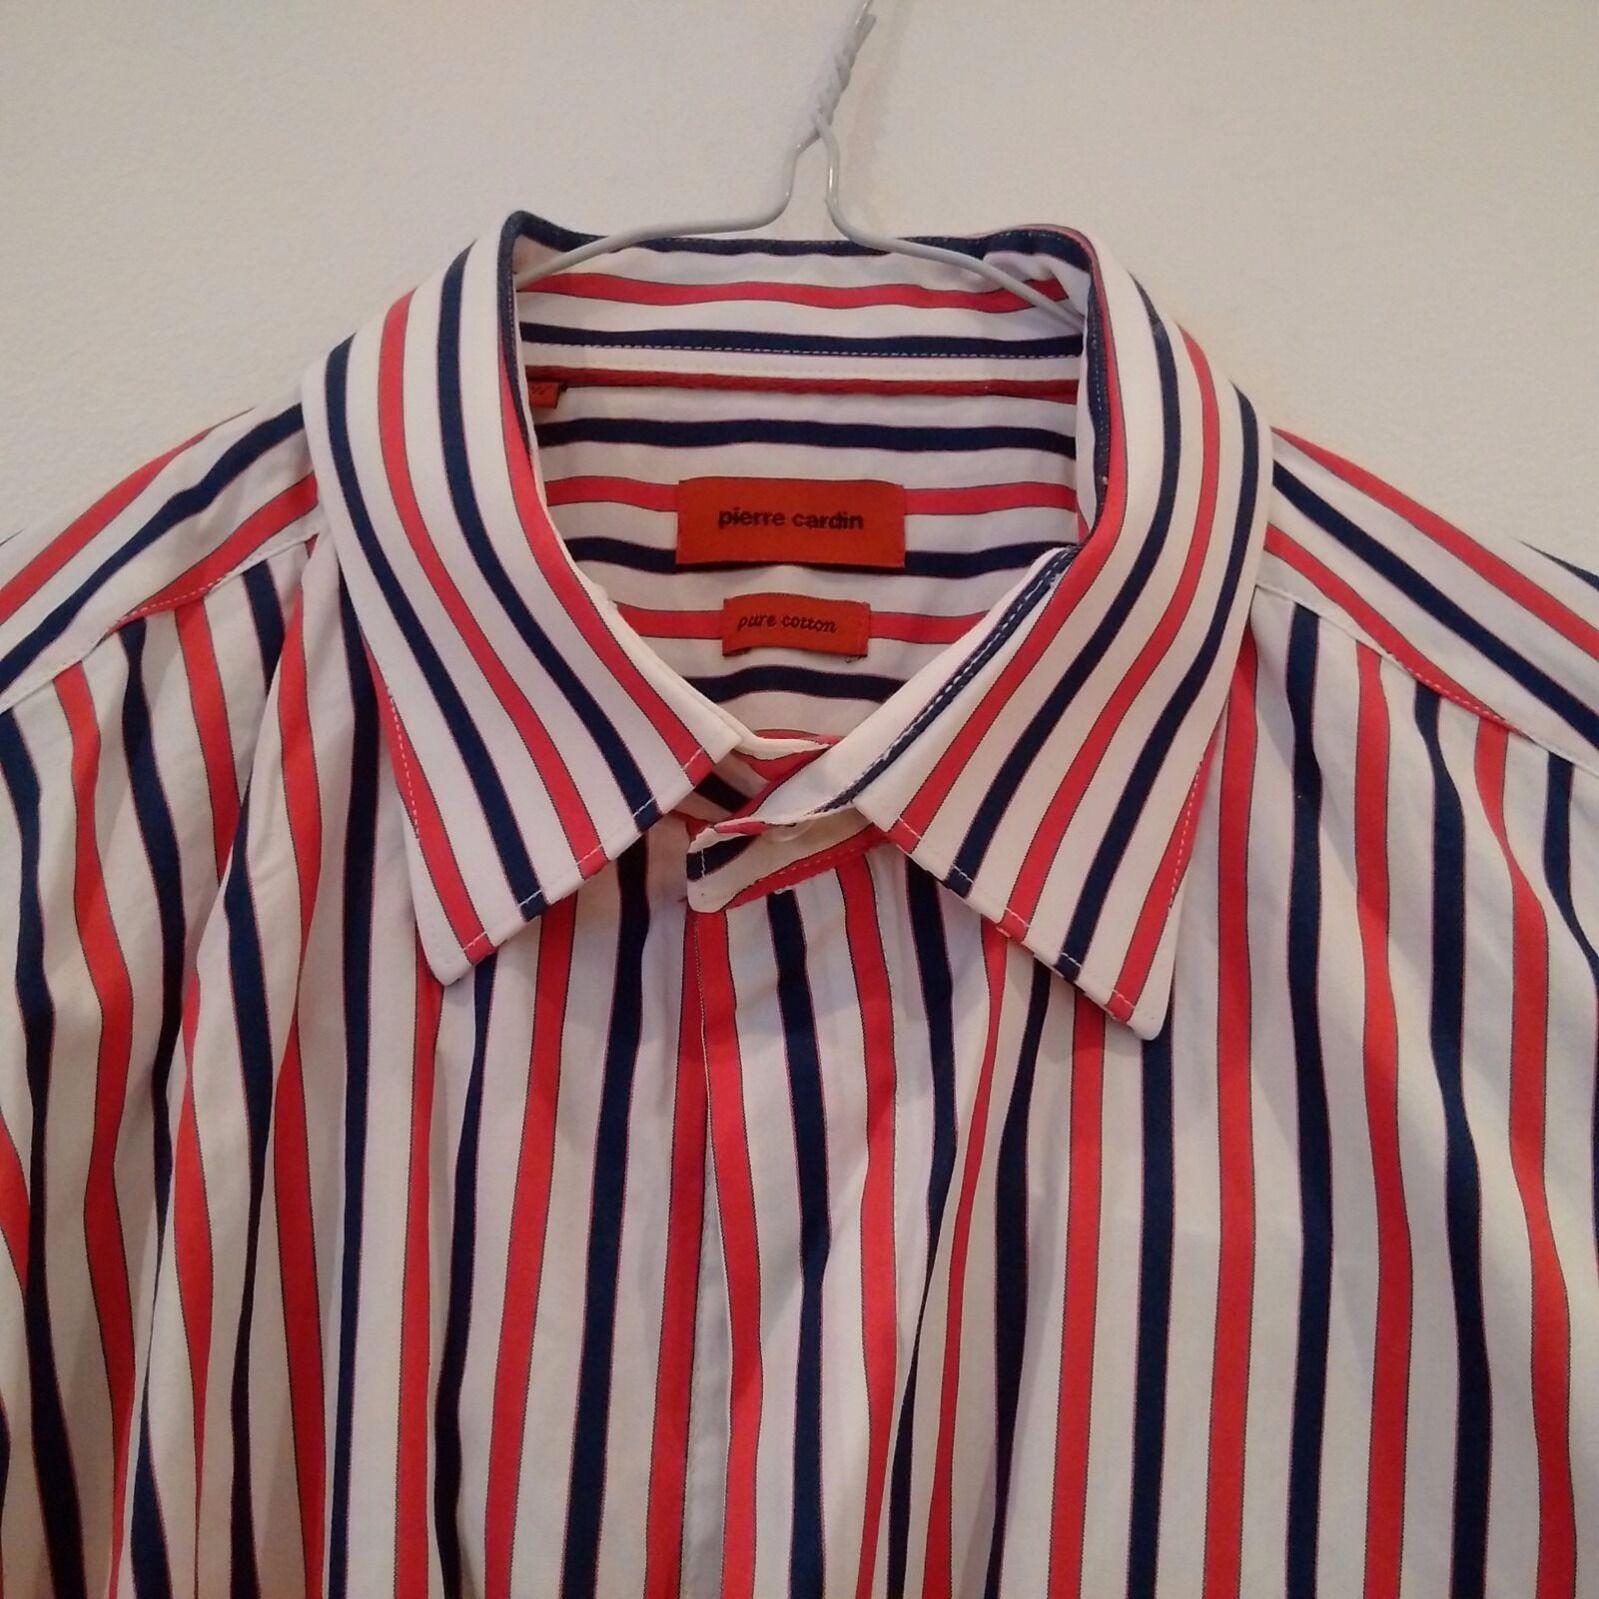 PIERRE CARDIN Mens Red Navy White Striped Short Sleeve Shirt 16.5